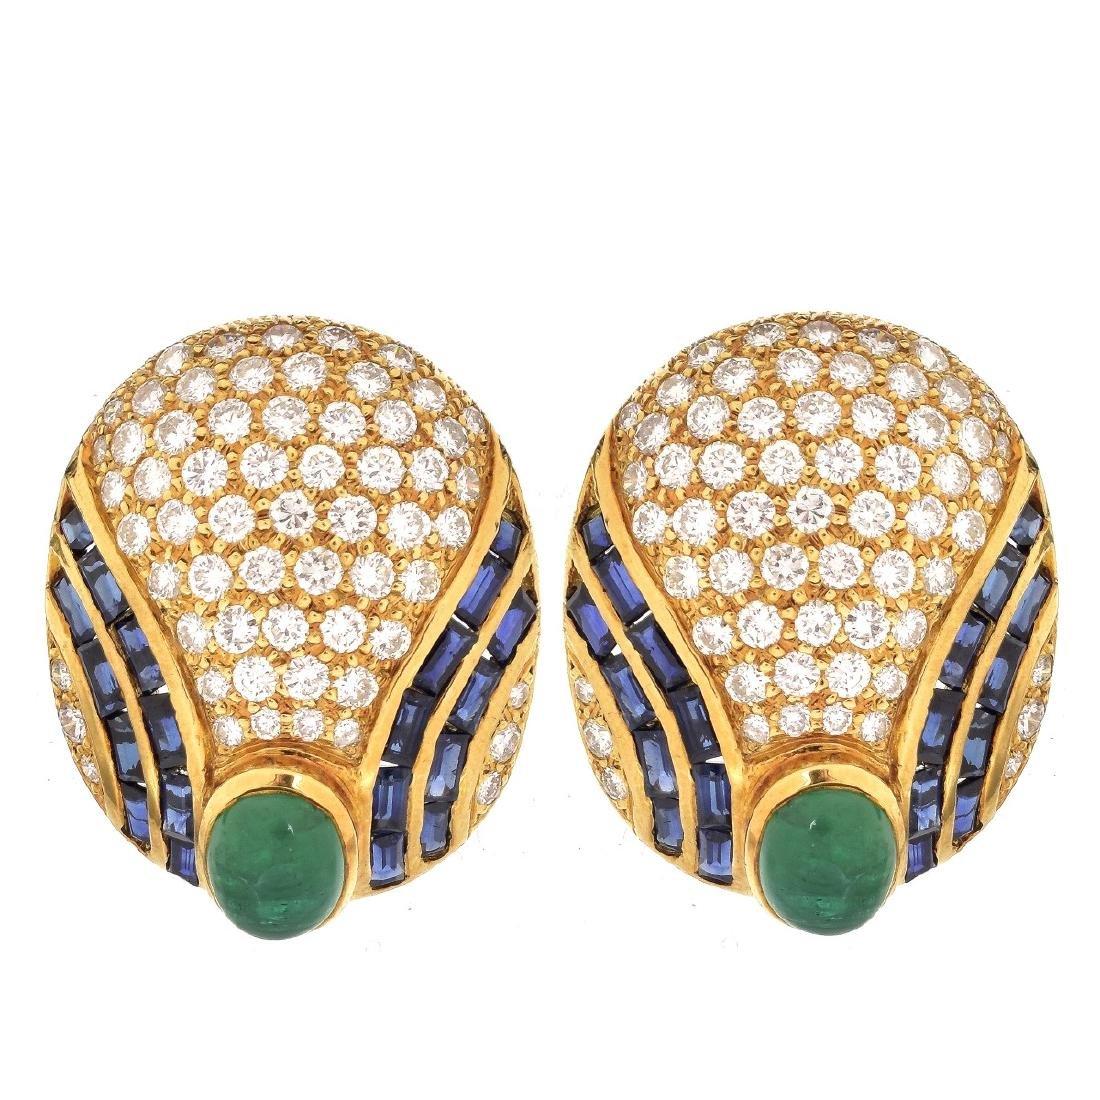 Diamond, Emerald, Sapphire and 18K Earrings